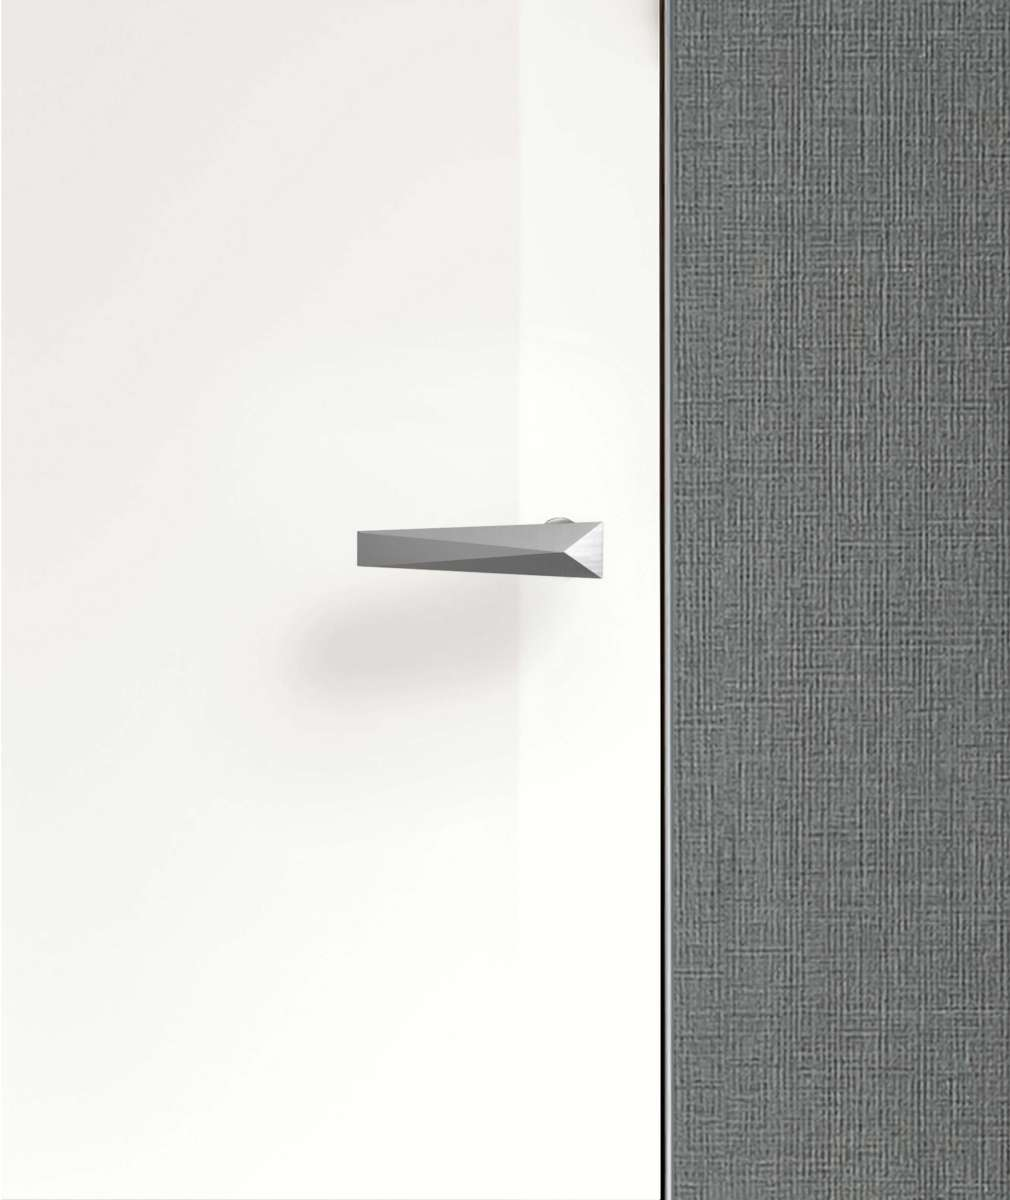 Studio Marco Piva – Product design – 327